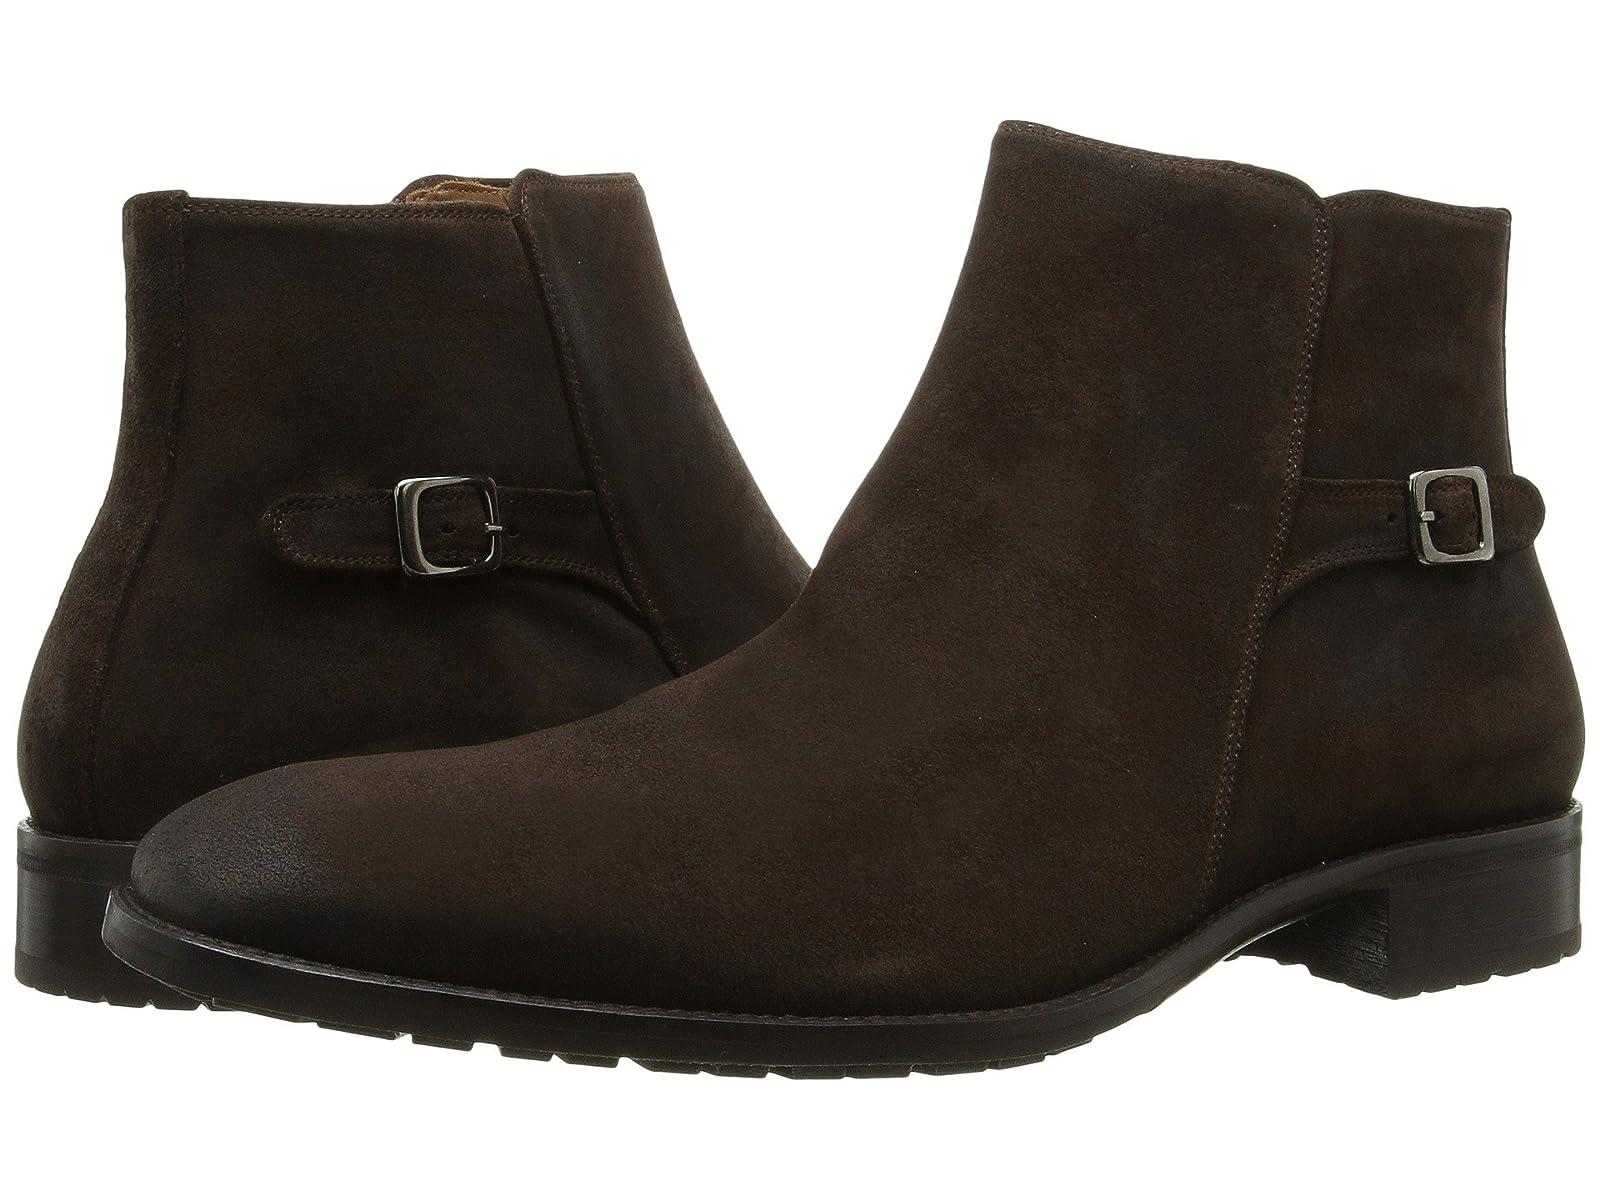 Mezlan ElvaCheap and distinctive eye-catching shoes